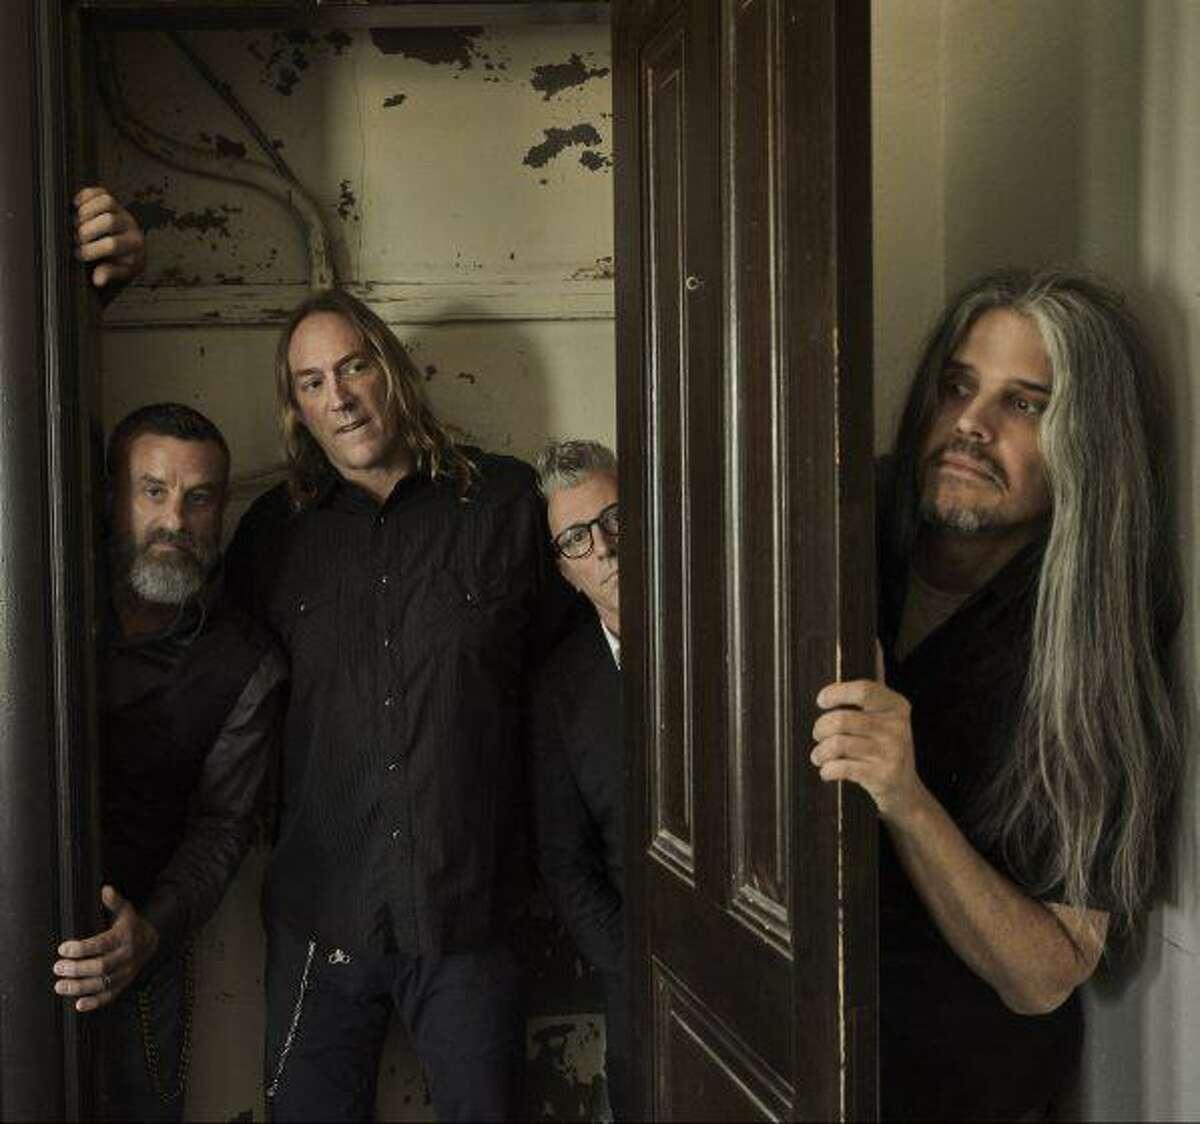 Tool: The prog-metal band's long-awaited new album,